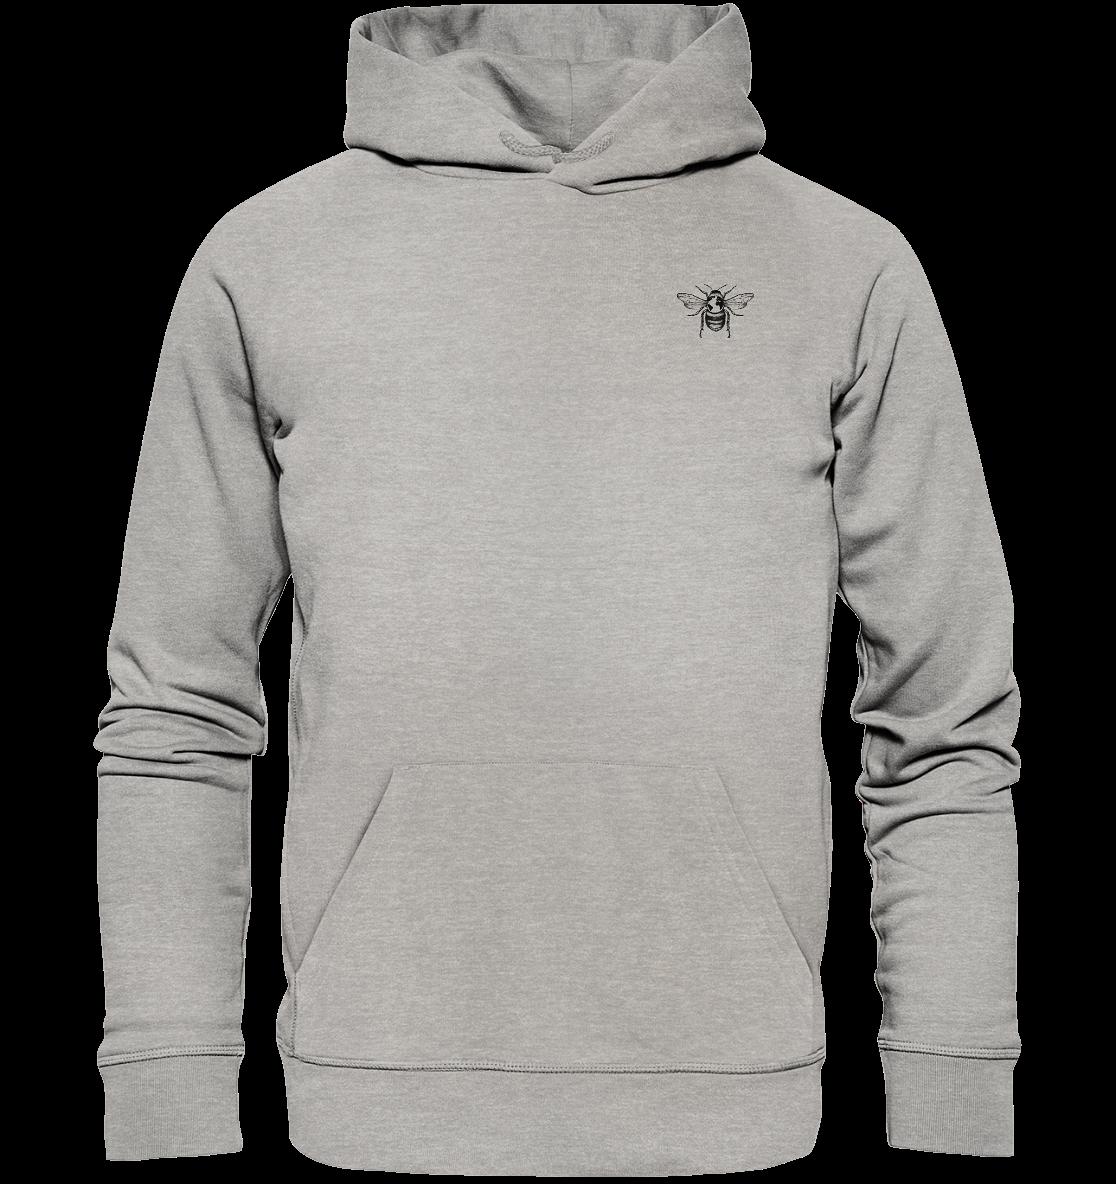 front-organic-hoodie-c2c1c0-1116x.png